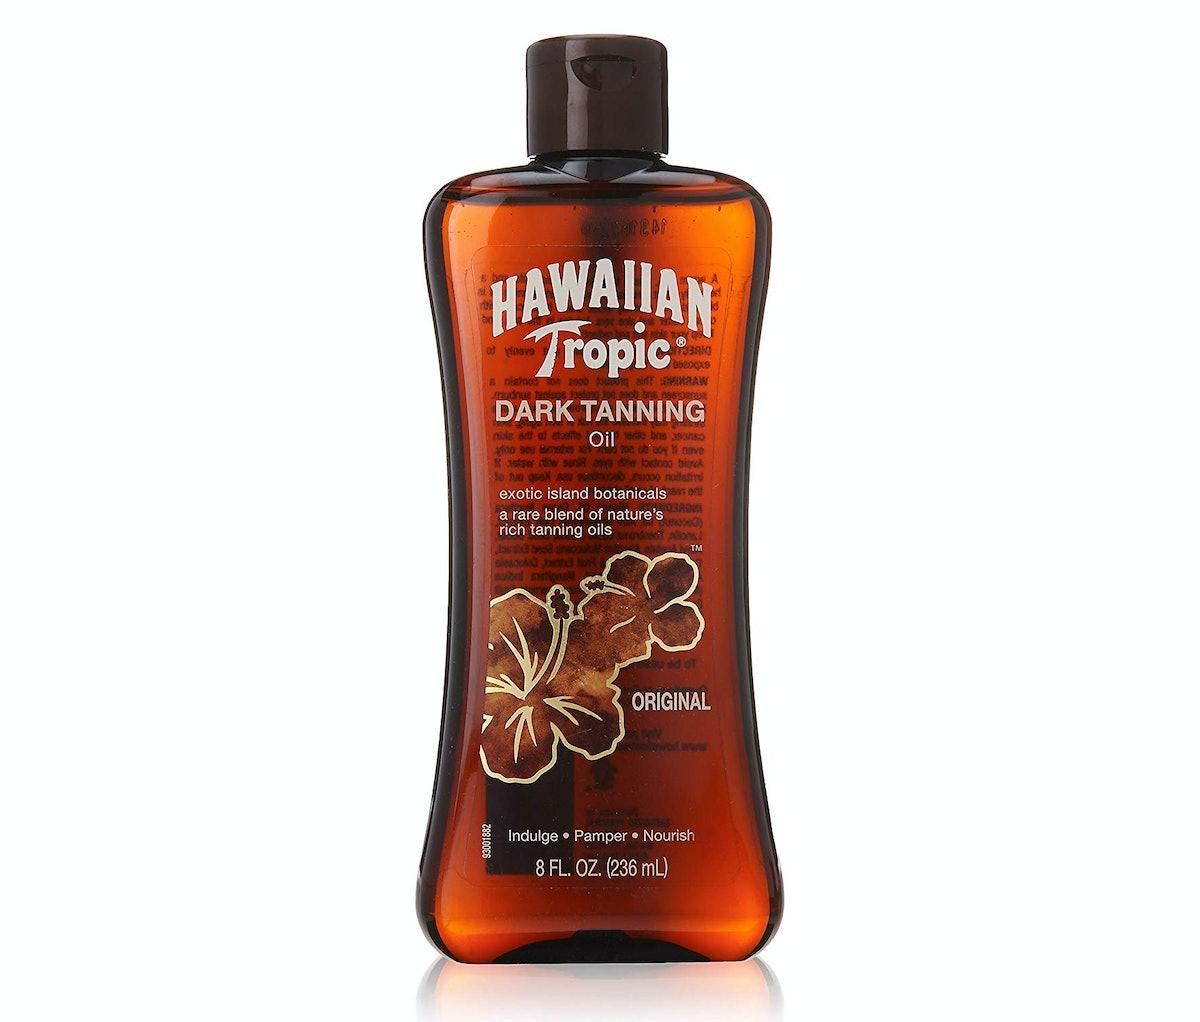 Hawaiian Tropic Dark Tanning Oil